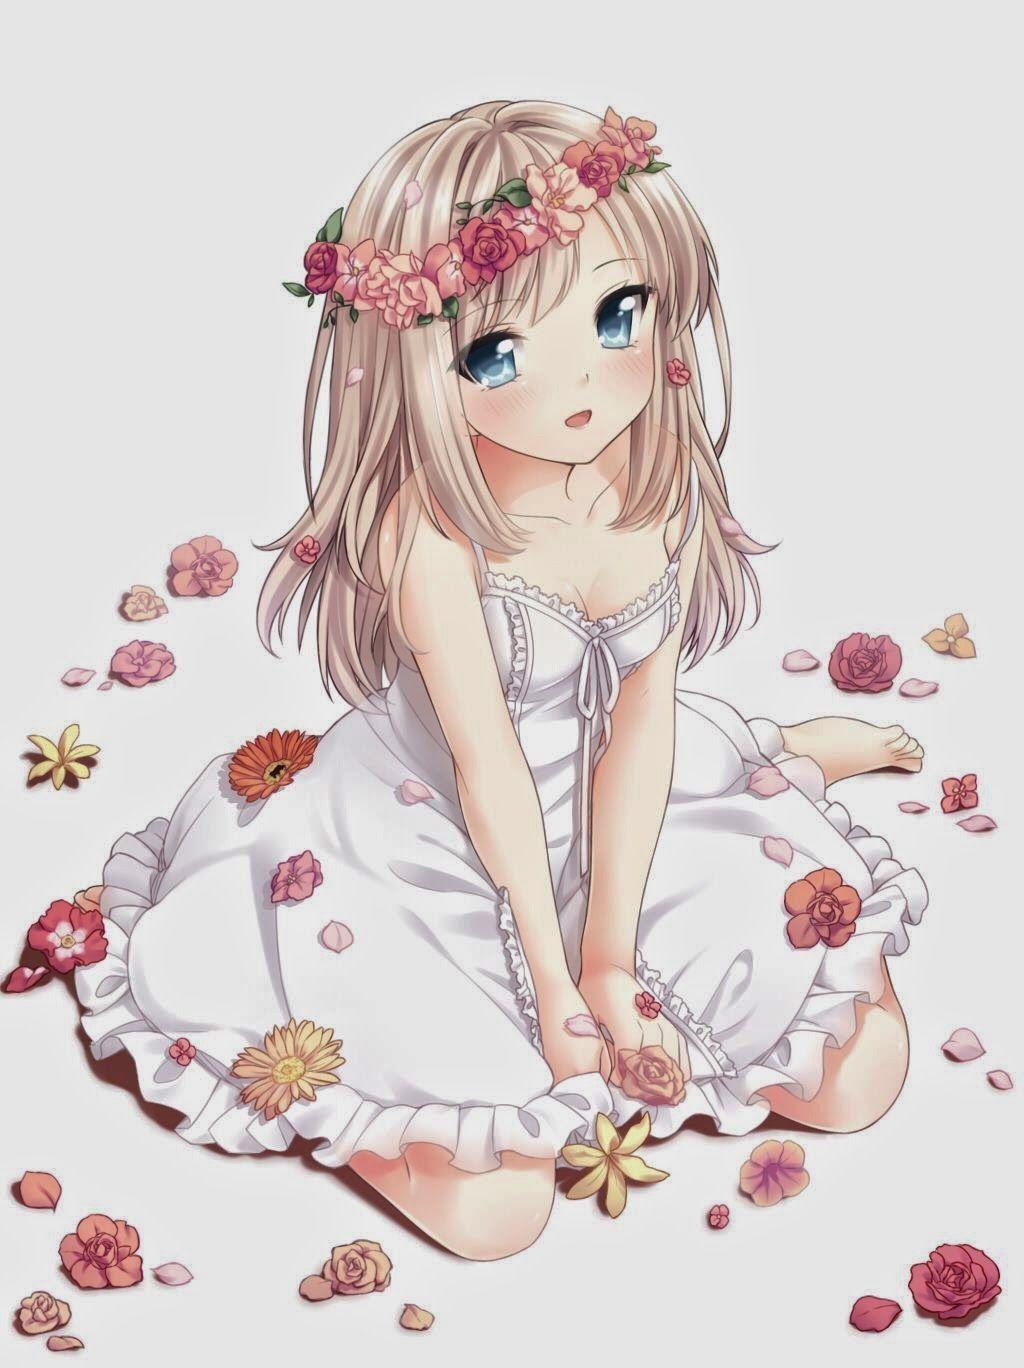 Cute Anime Flowergirl Anime Stuff Pinterest Anime